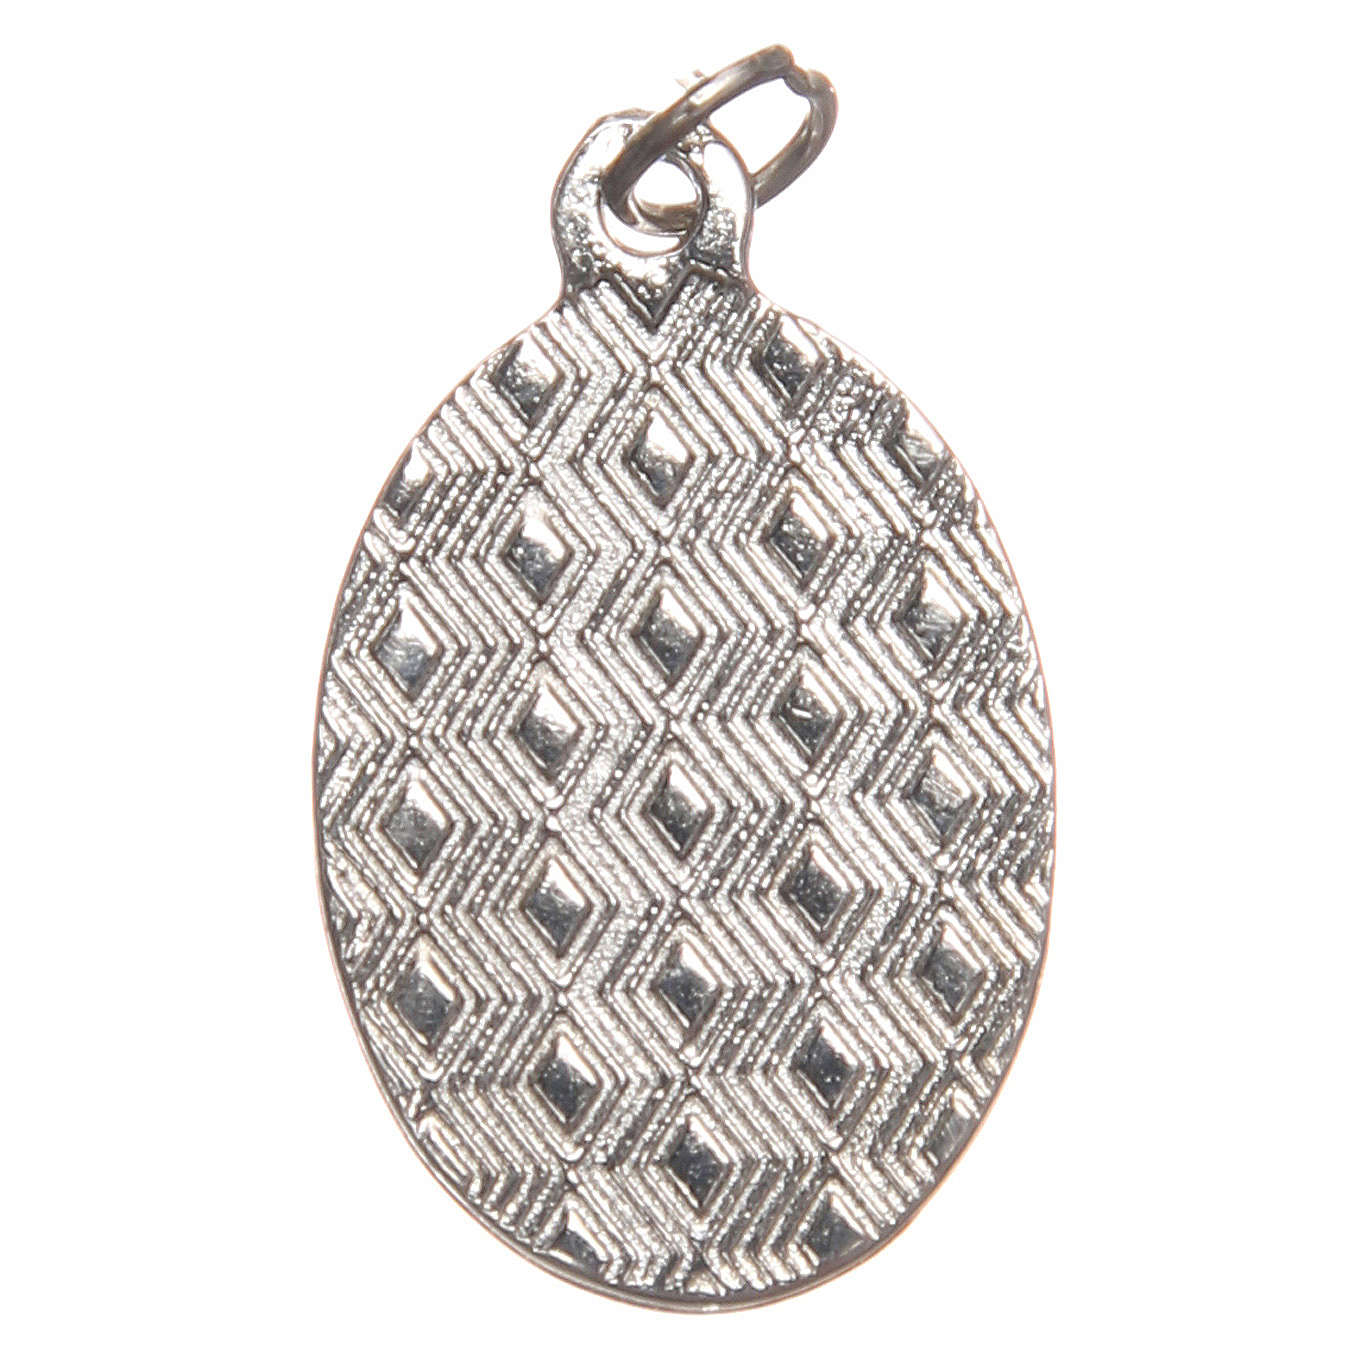 STOCK Medalla Última Cena metal niquelado resina cm 2,5 4